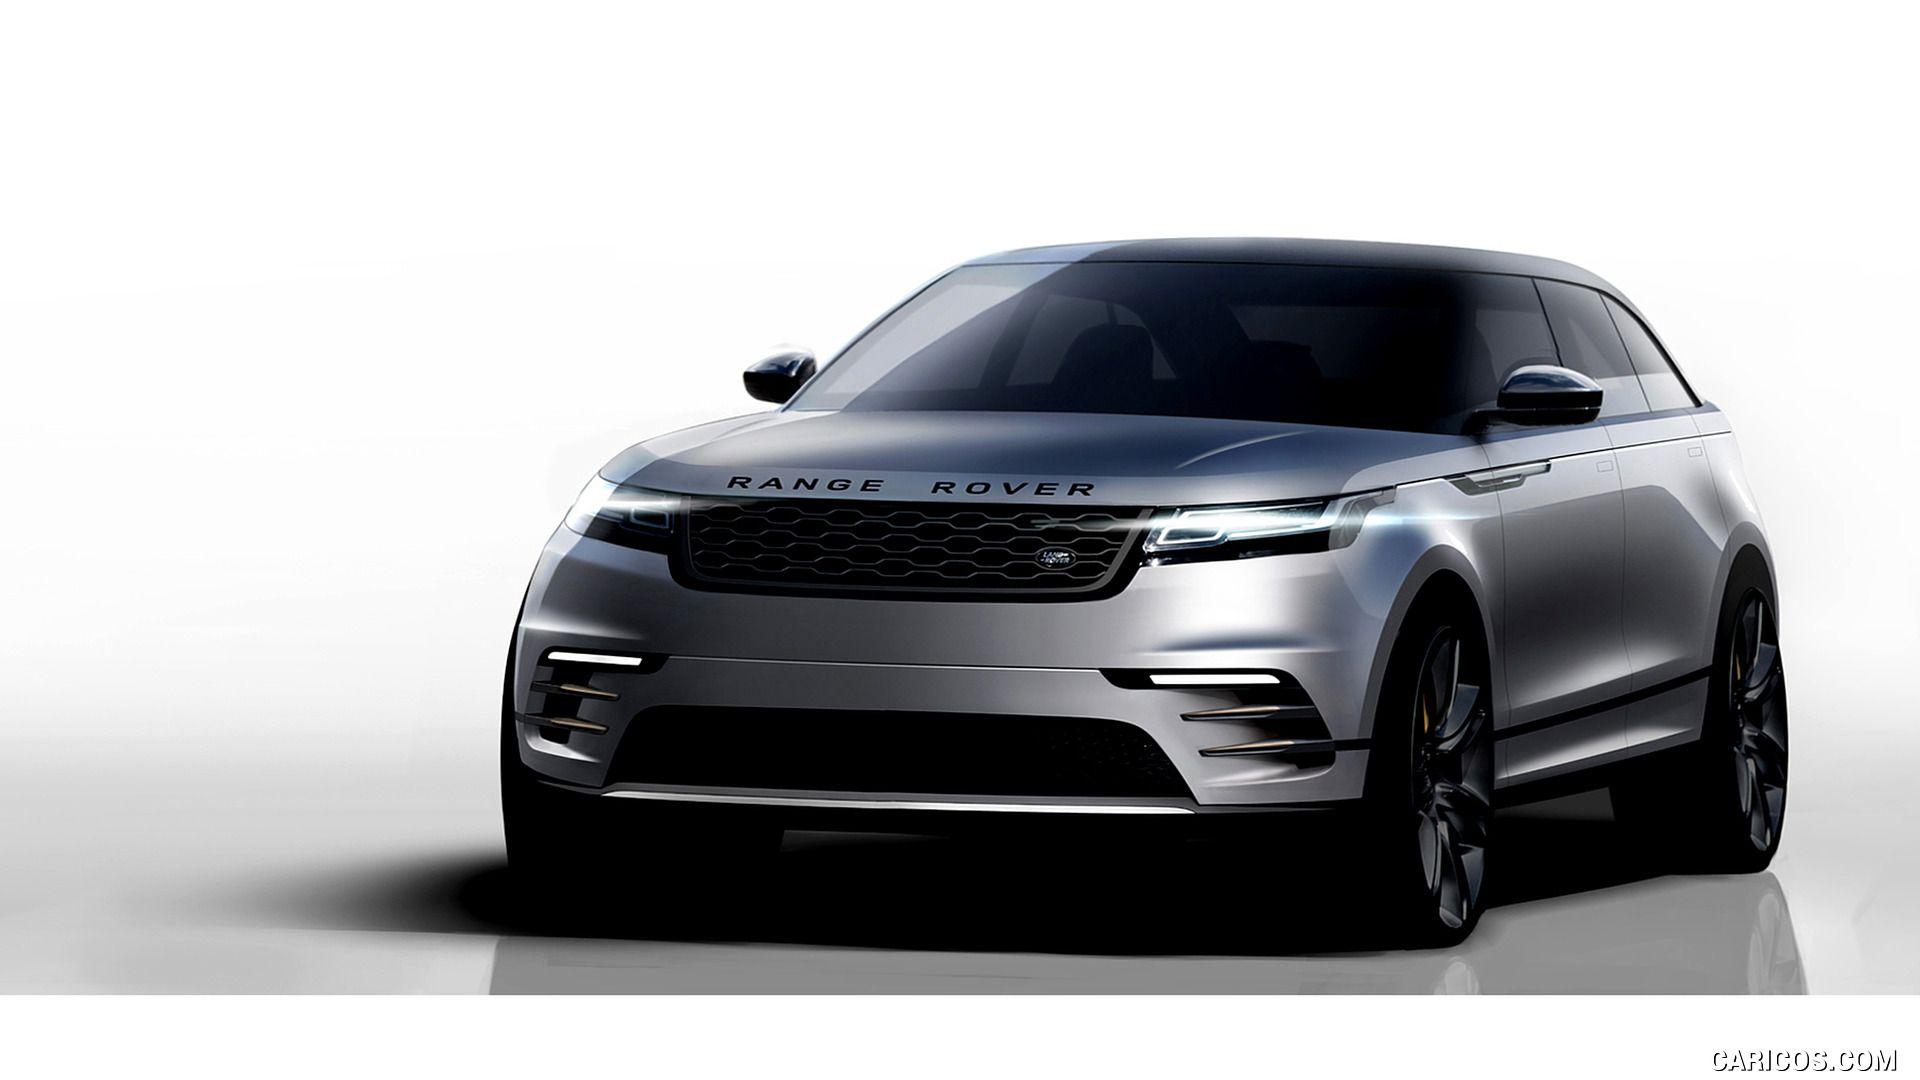 2018 Range Rover Velar Wallpaper Transportation Design